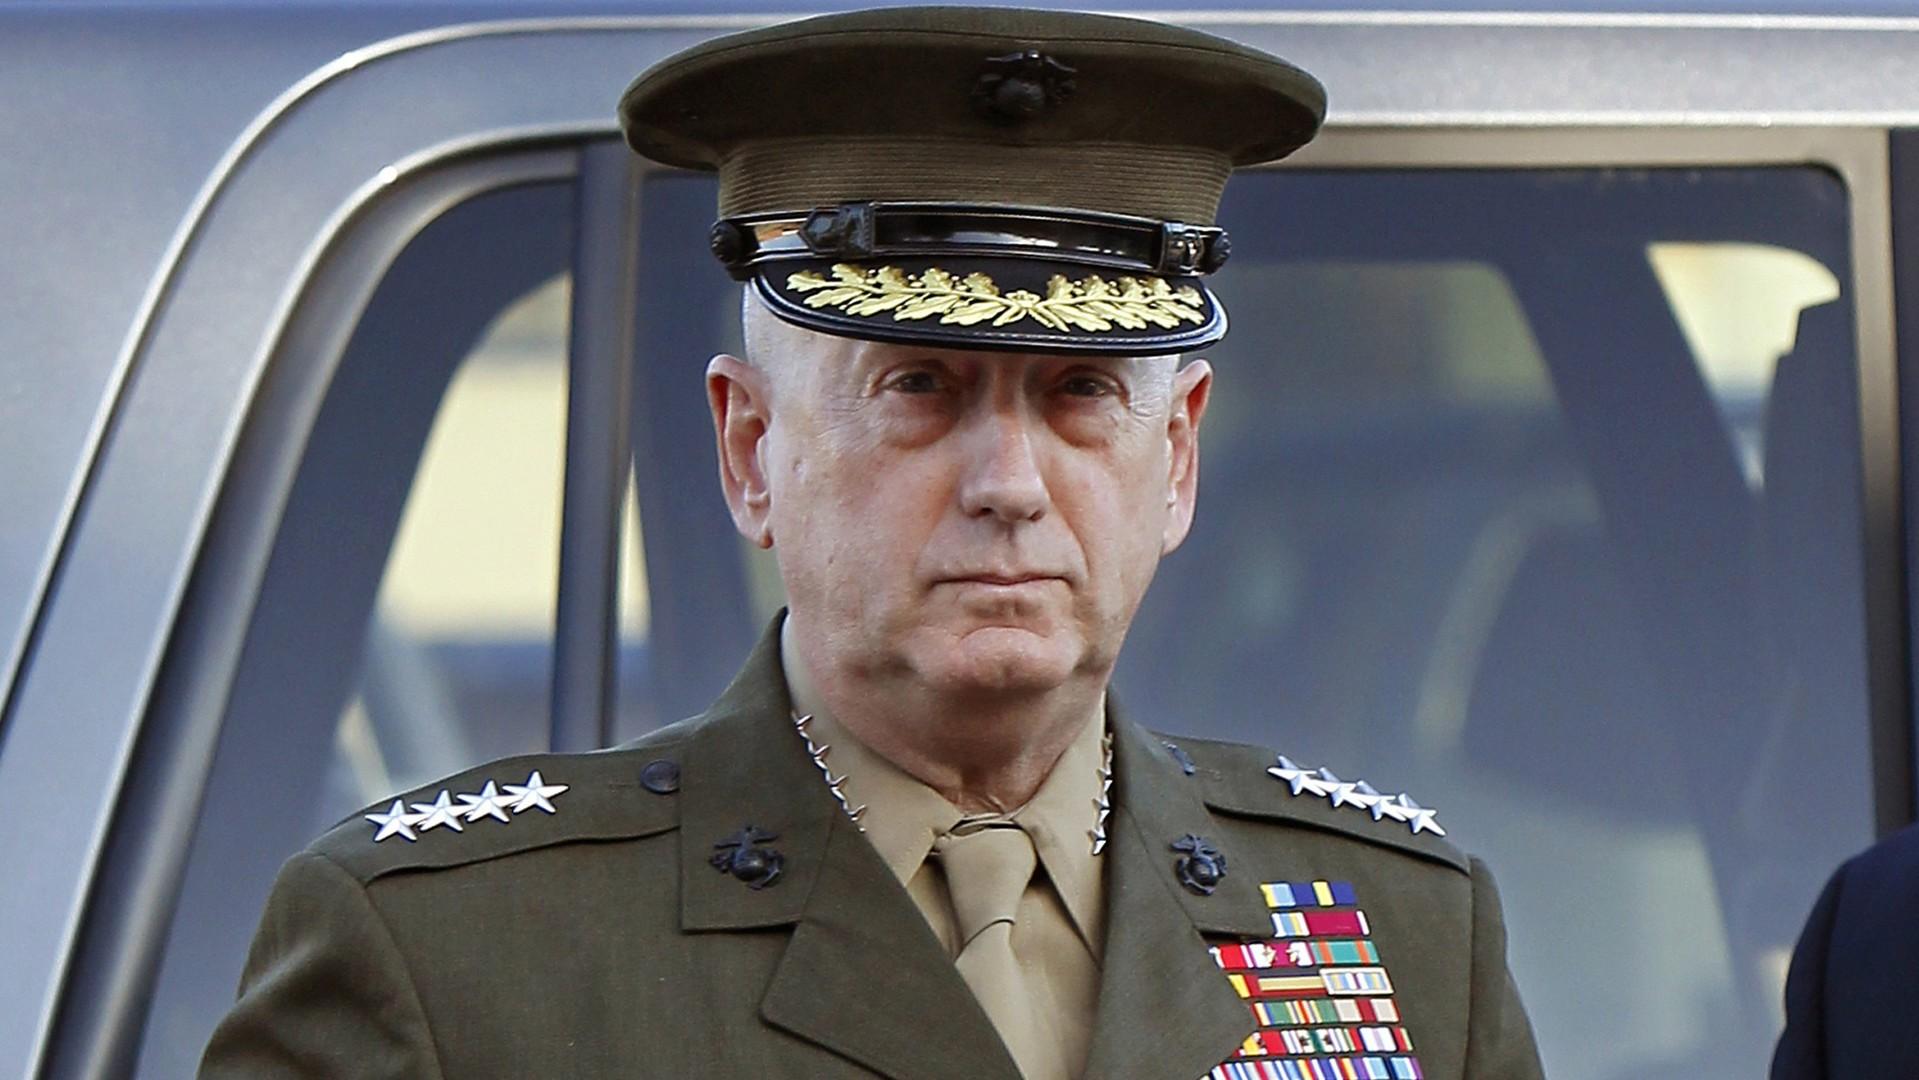 Руководитель Пентагона установил жесткое условие НАТО и разъяснил последствия отказа